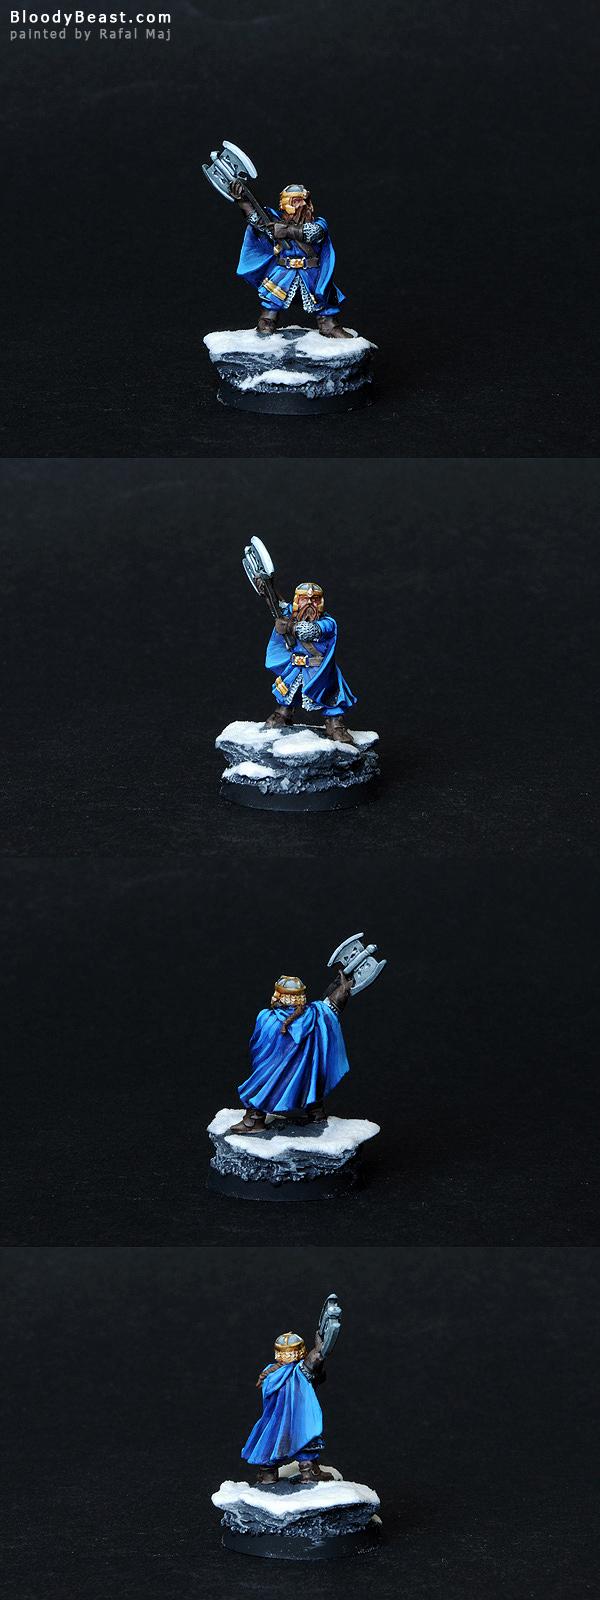 Gimli painted by Rafal Maj (BloodyBeast.com)